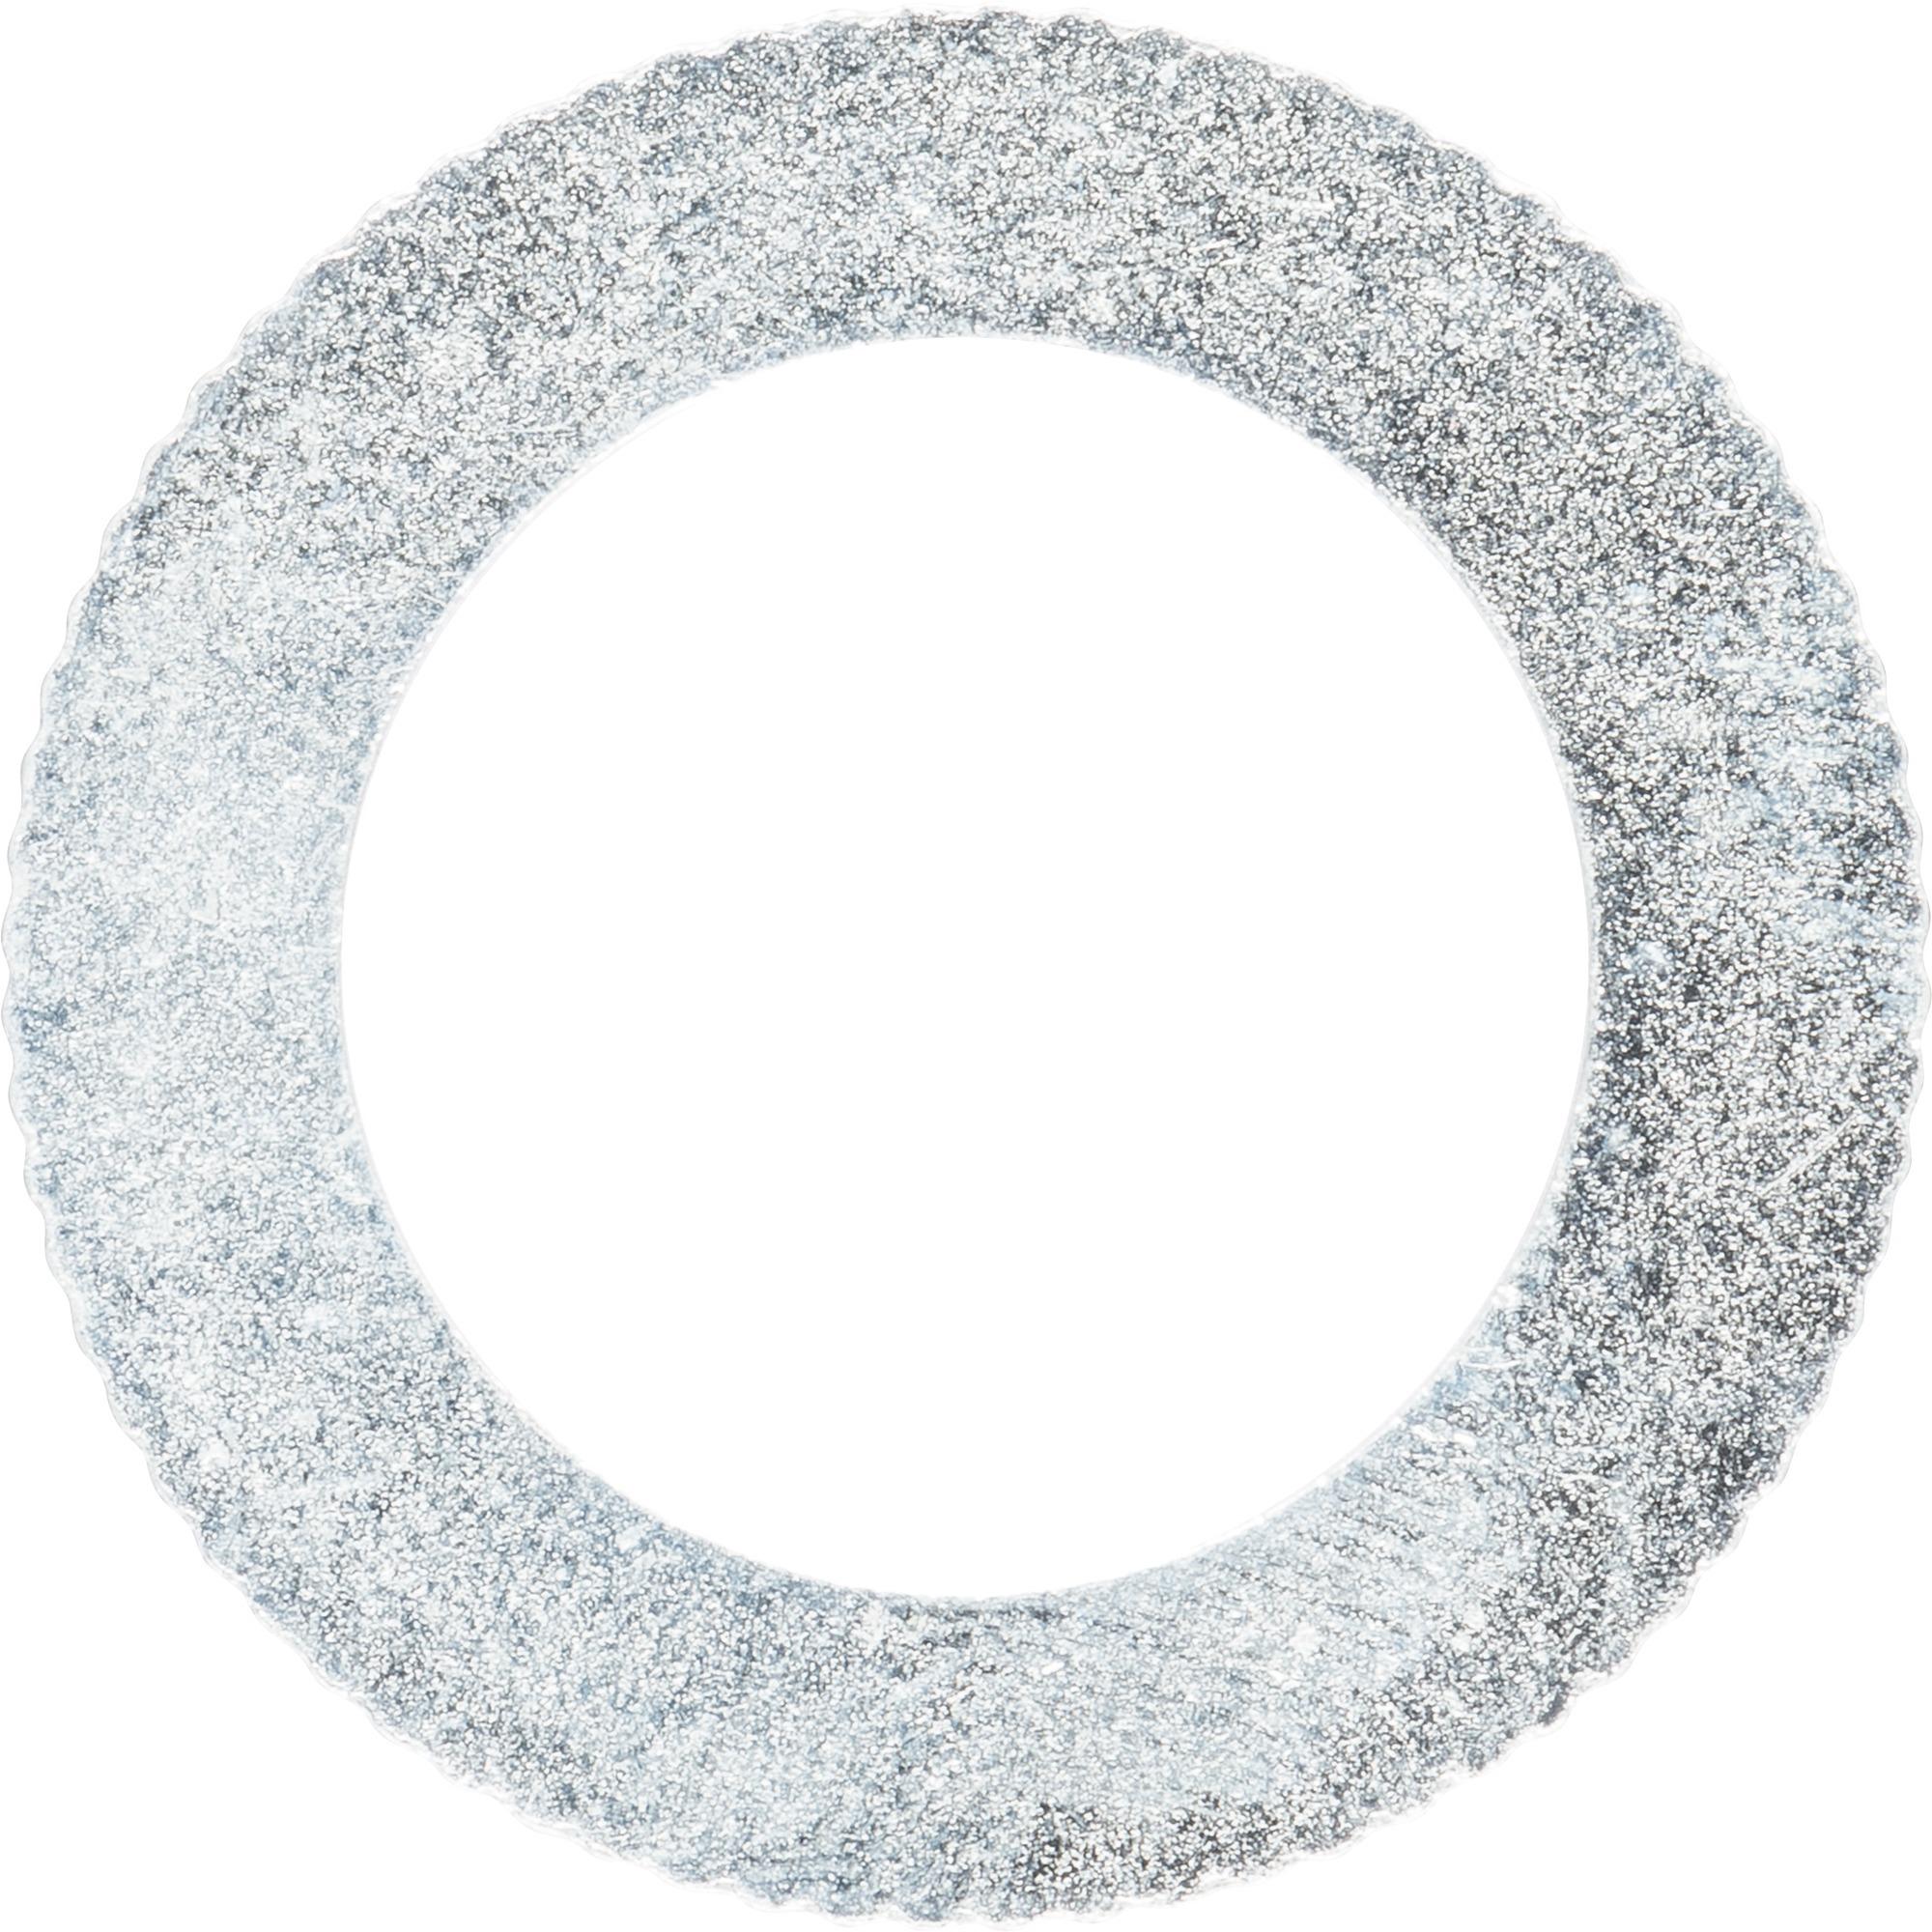 2 600 100 202 accesorio de sierras circulares, Adaptador